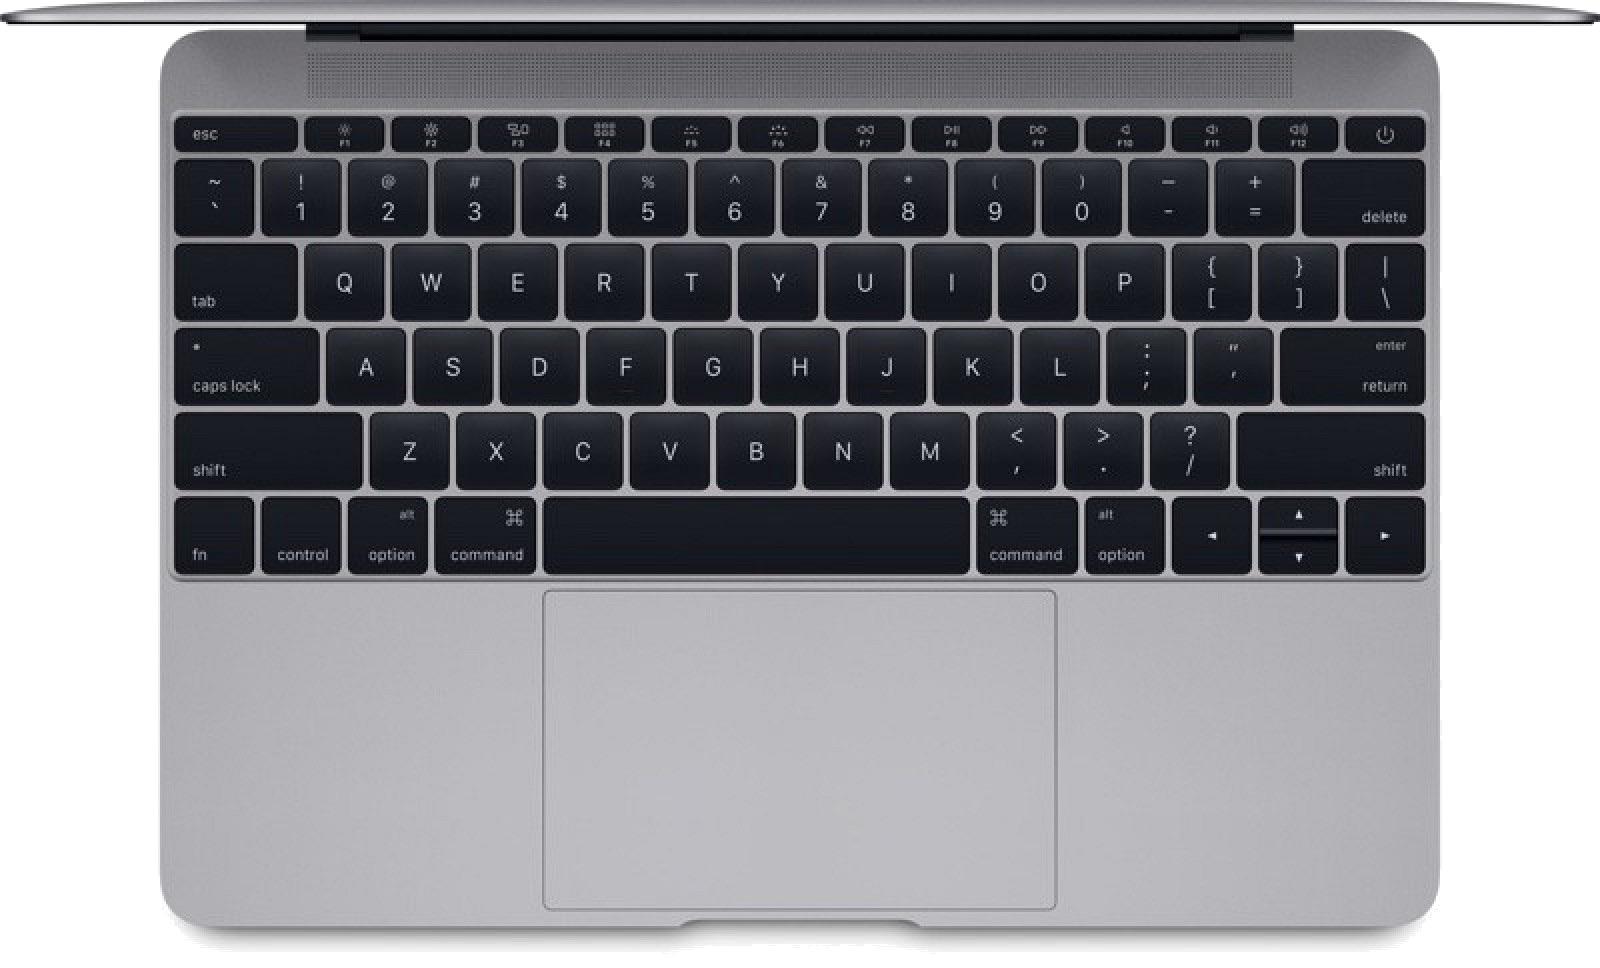 Retina MacBook 12 Inch Model - Keyboard Redesign